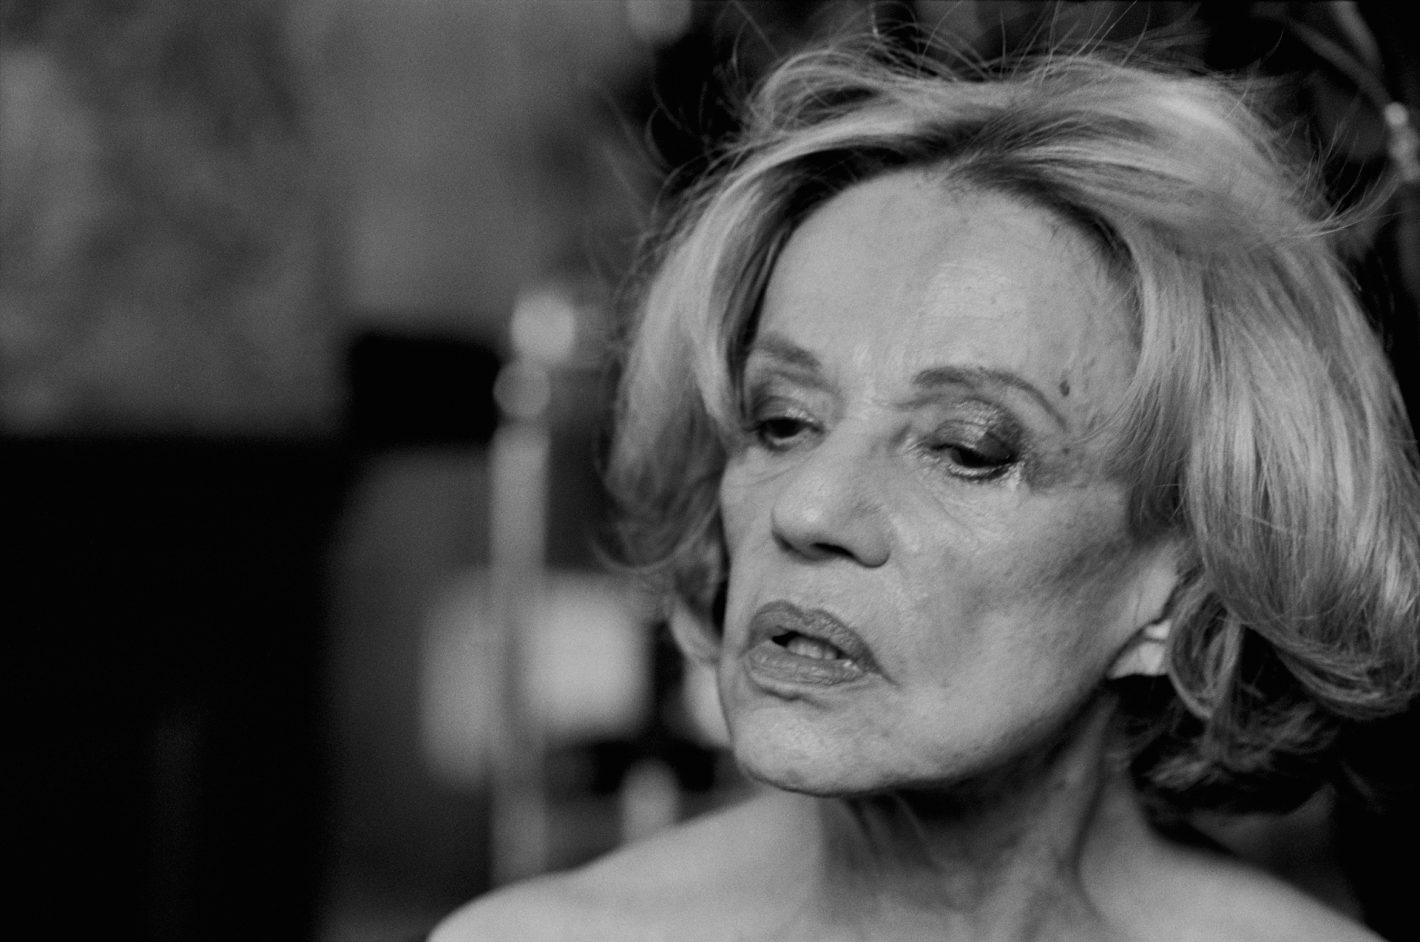 Jeanne Moreau, Paris, 2003 Vanity Fair © Peter Lindbergh (Courtesy of Peter Lindbergh, Paris / Gagosian Gallery)